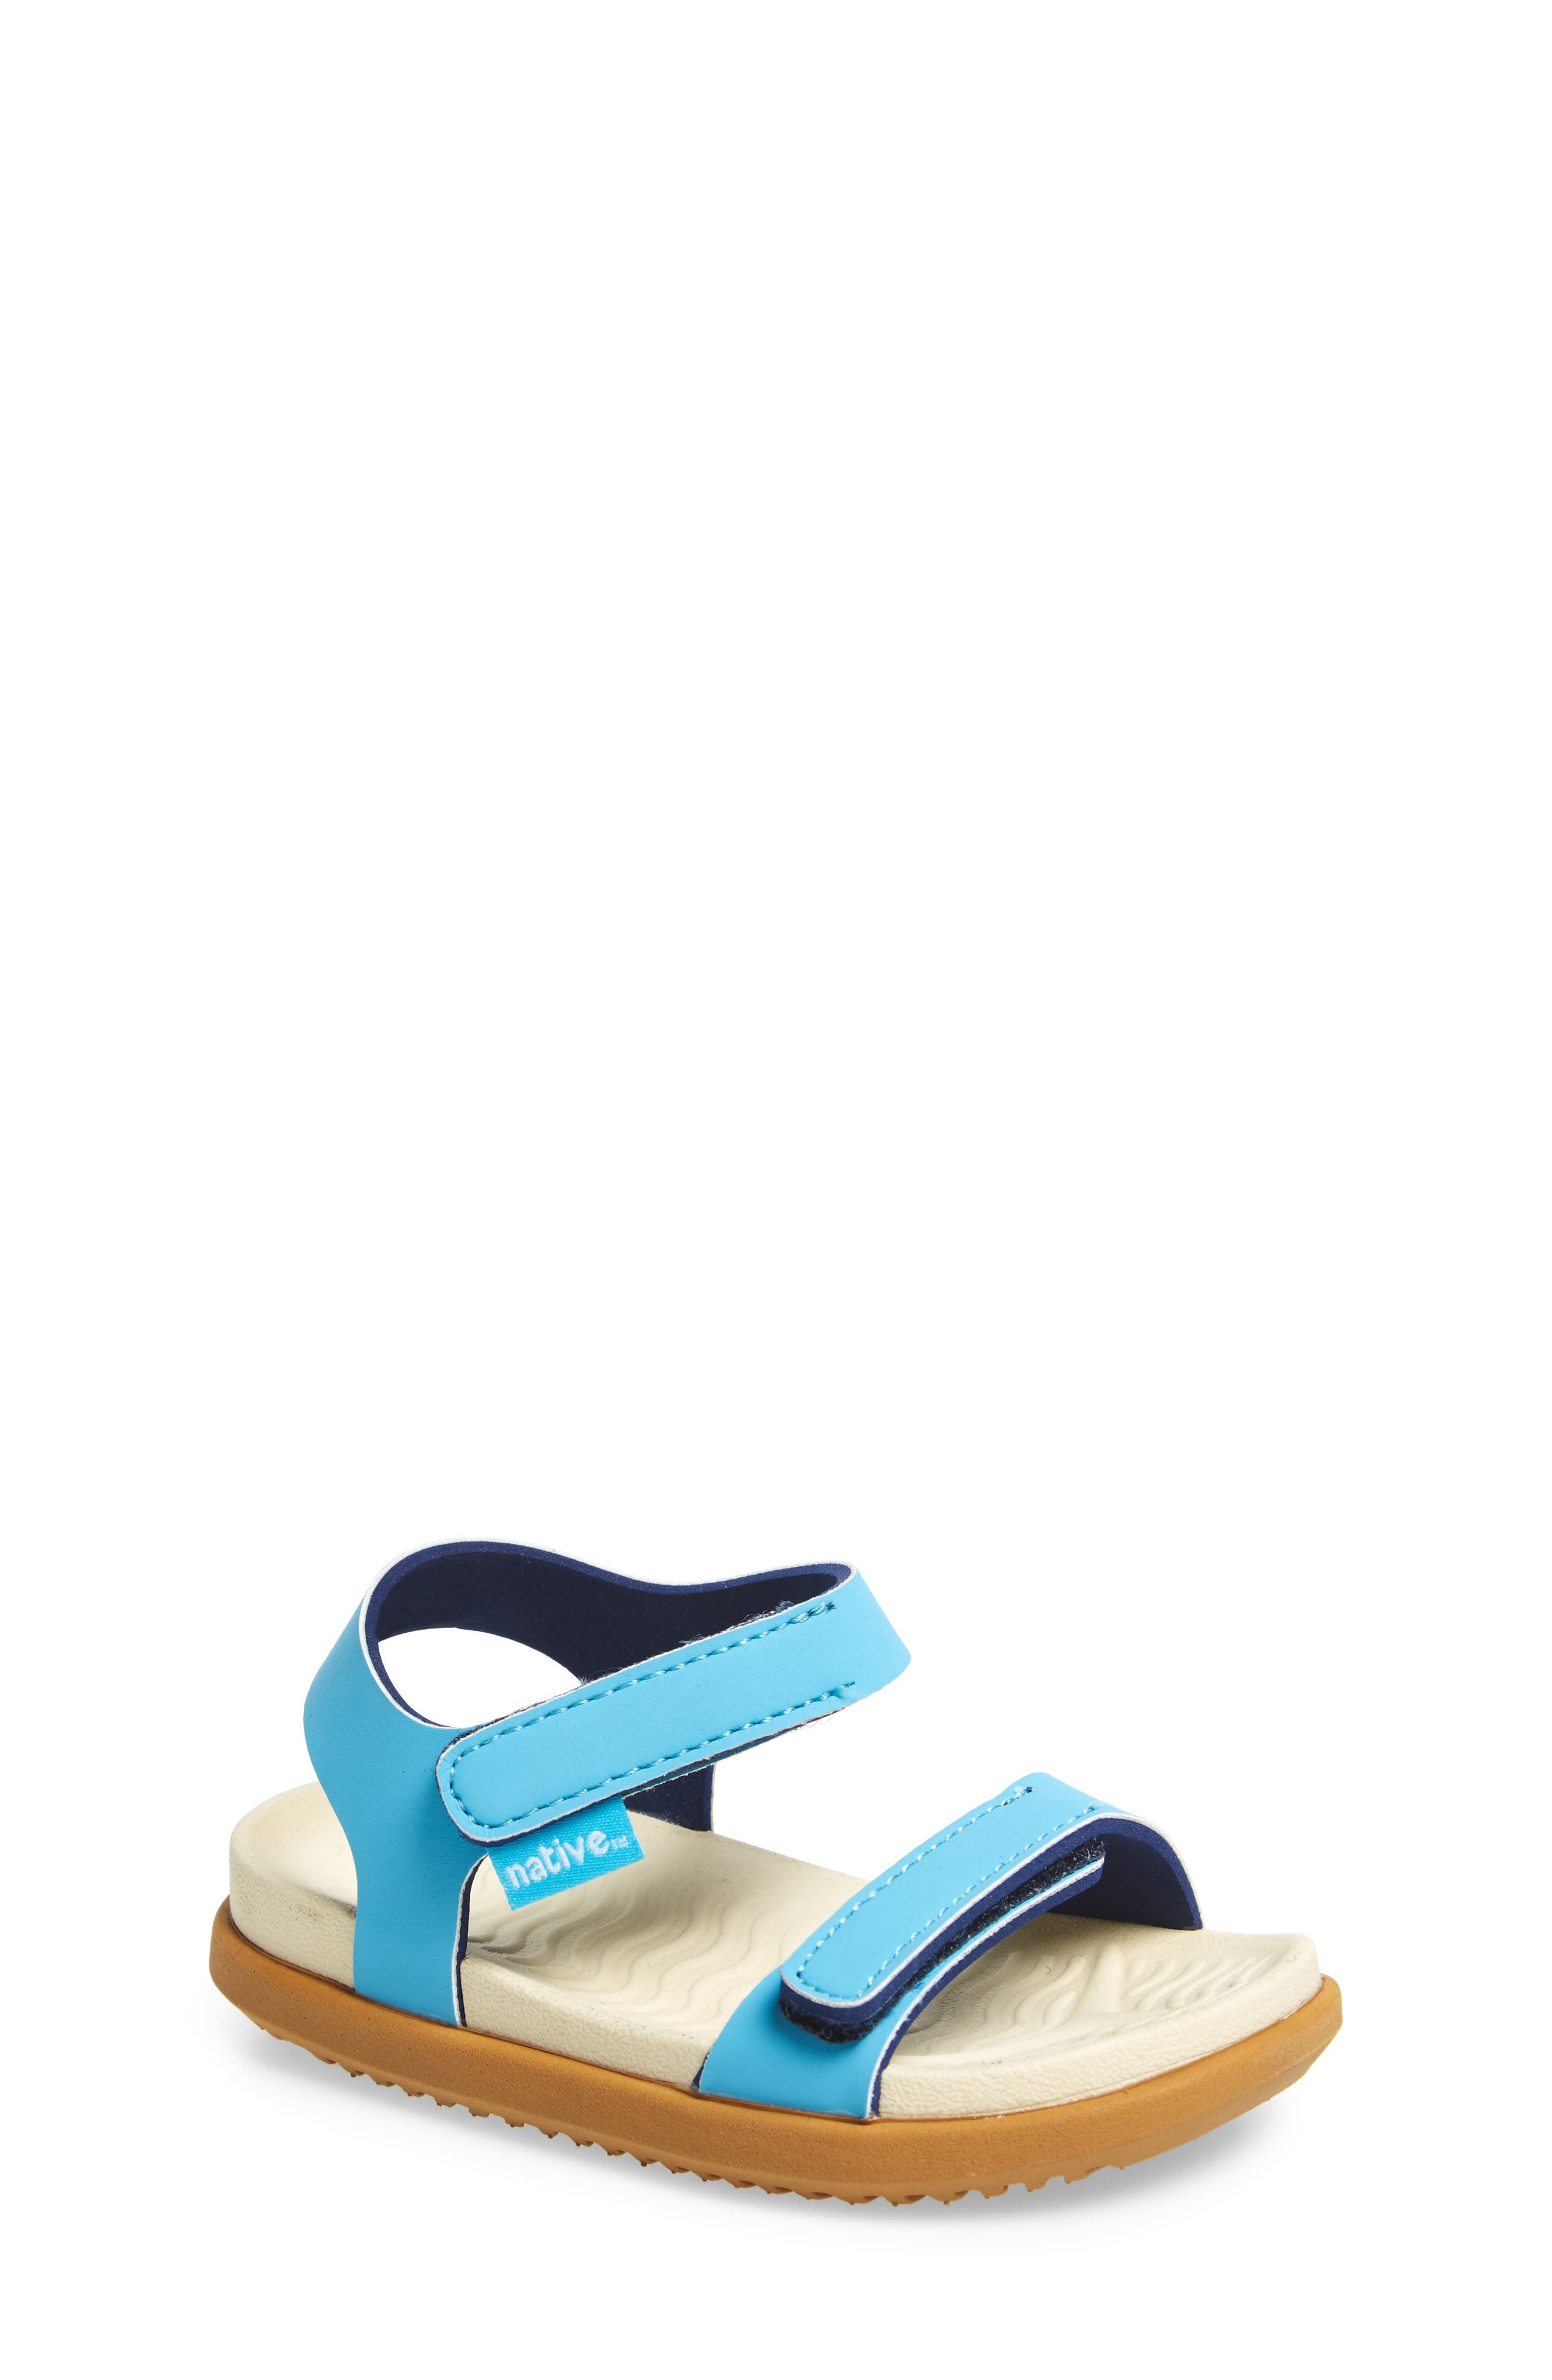 Native Shoes Charley Child Waterproof Flat Sandal (Walker, Toddler, Little Kid & Big Kid)